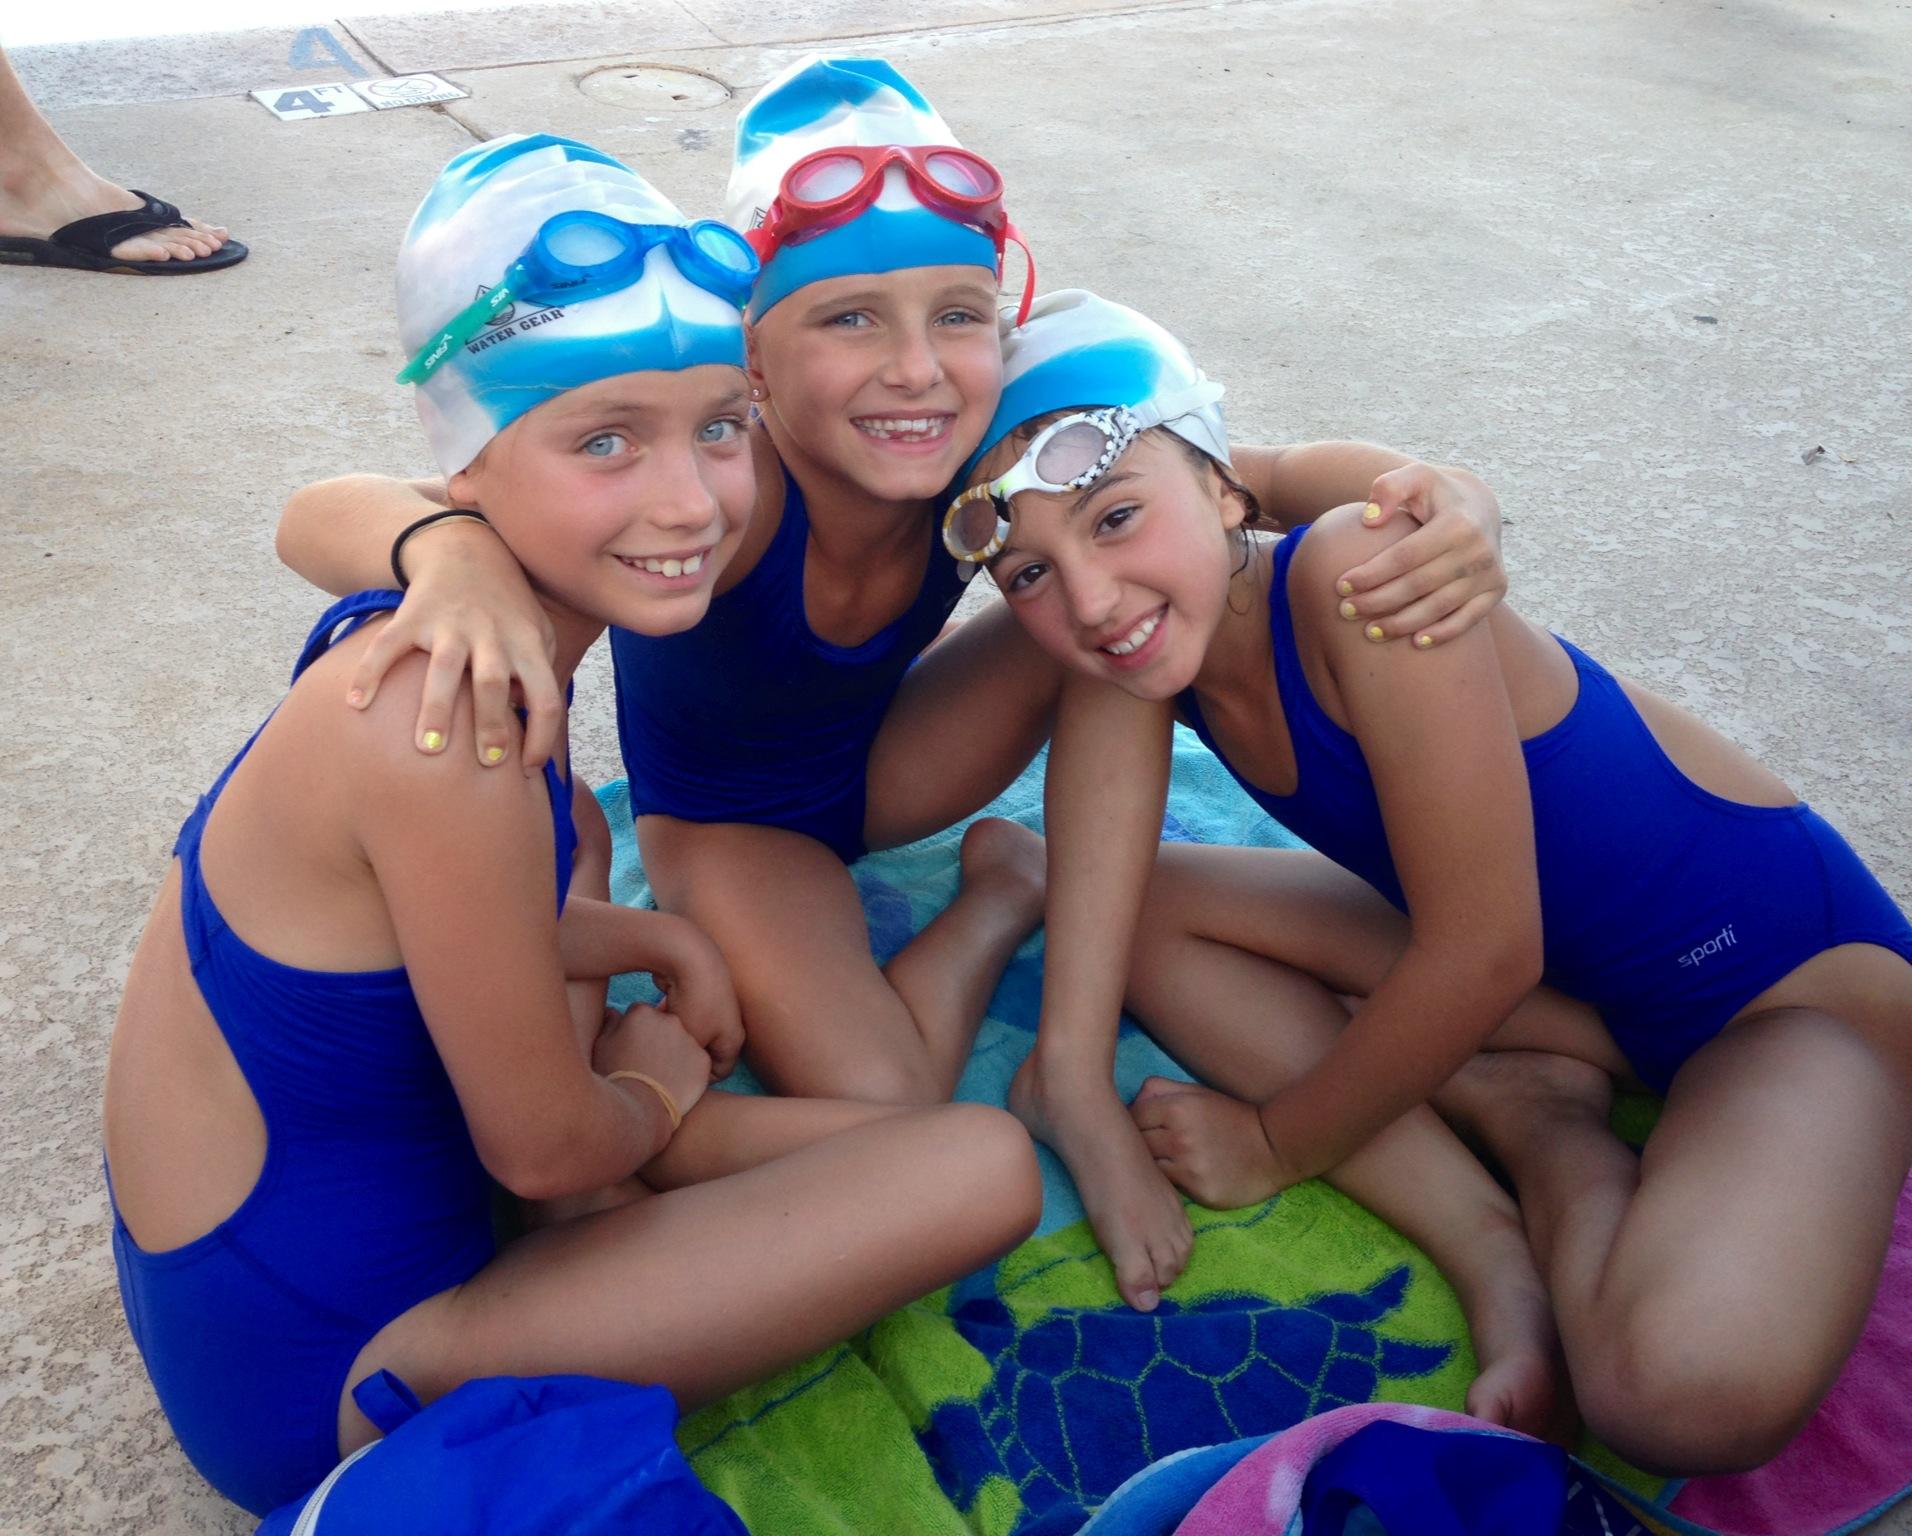 marist college swim meet results